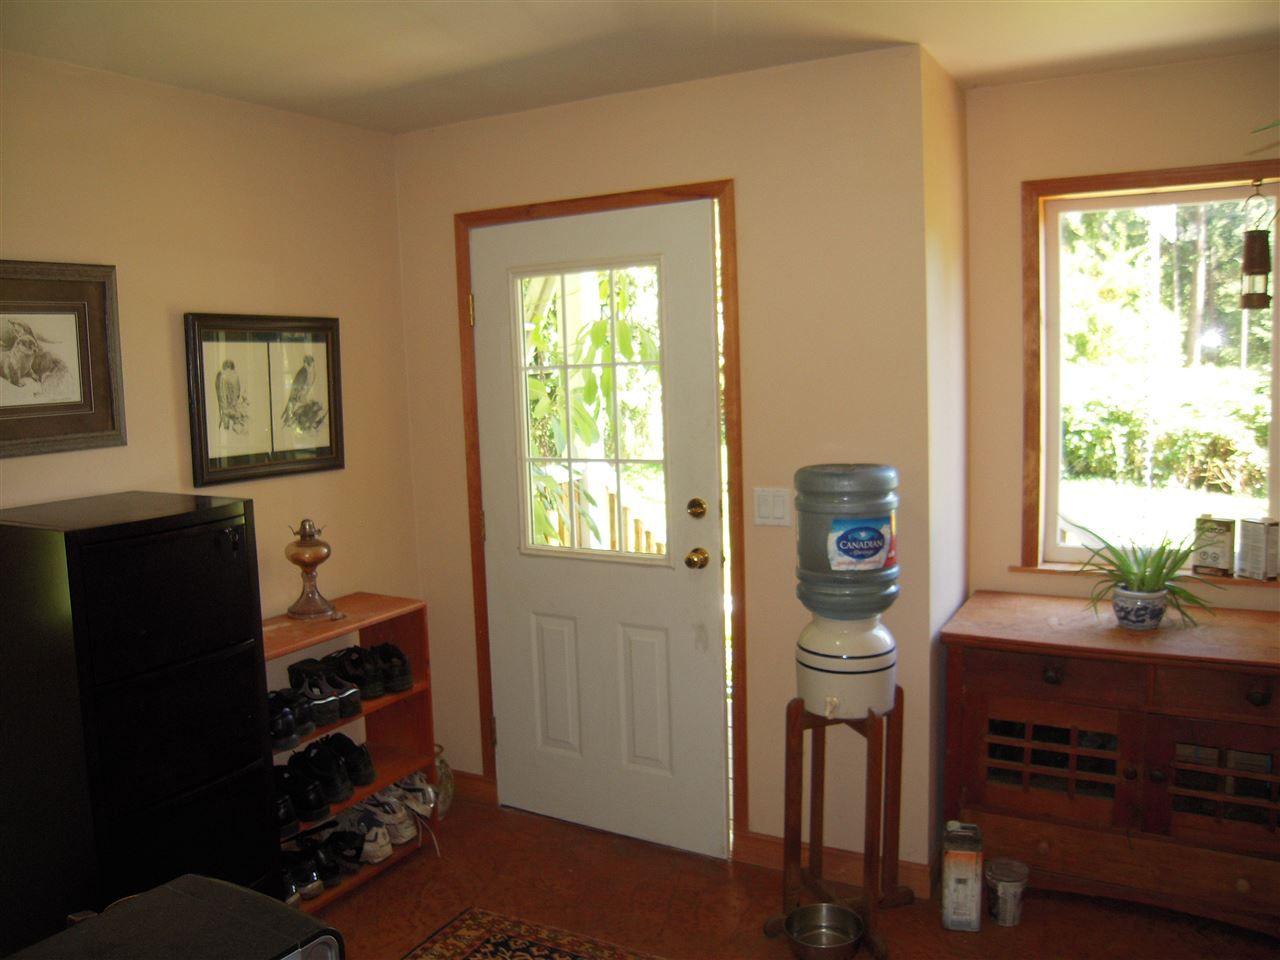 Photo 12: Photos: 2670 LOWER Road: Roberts Creek House for sale (Sunshine Coast)  : MLS®# R2096275